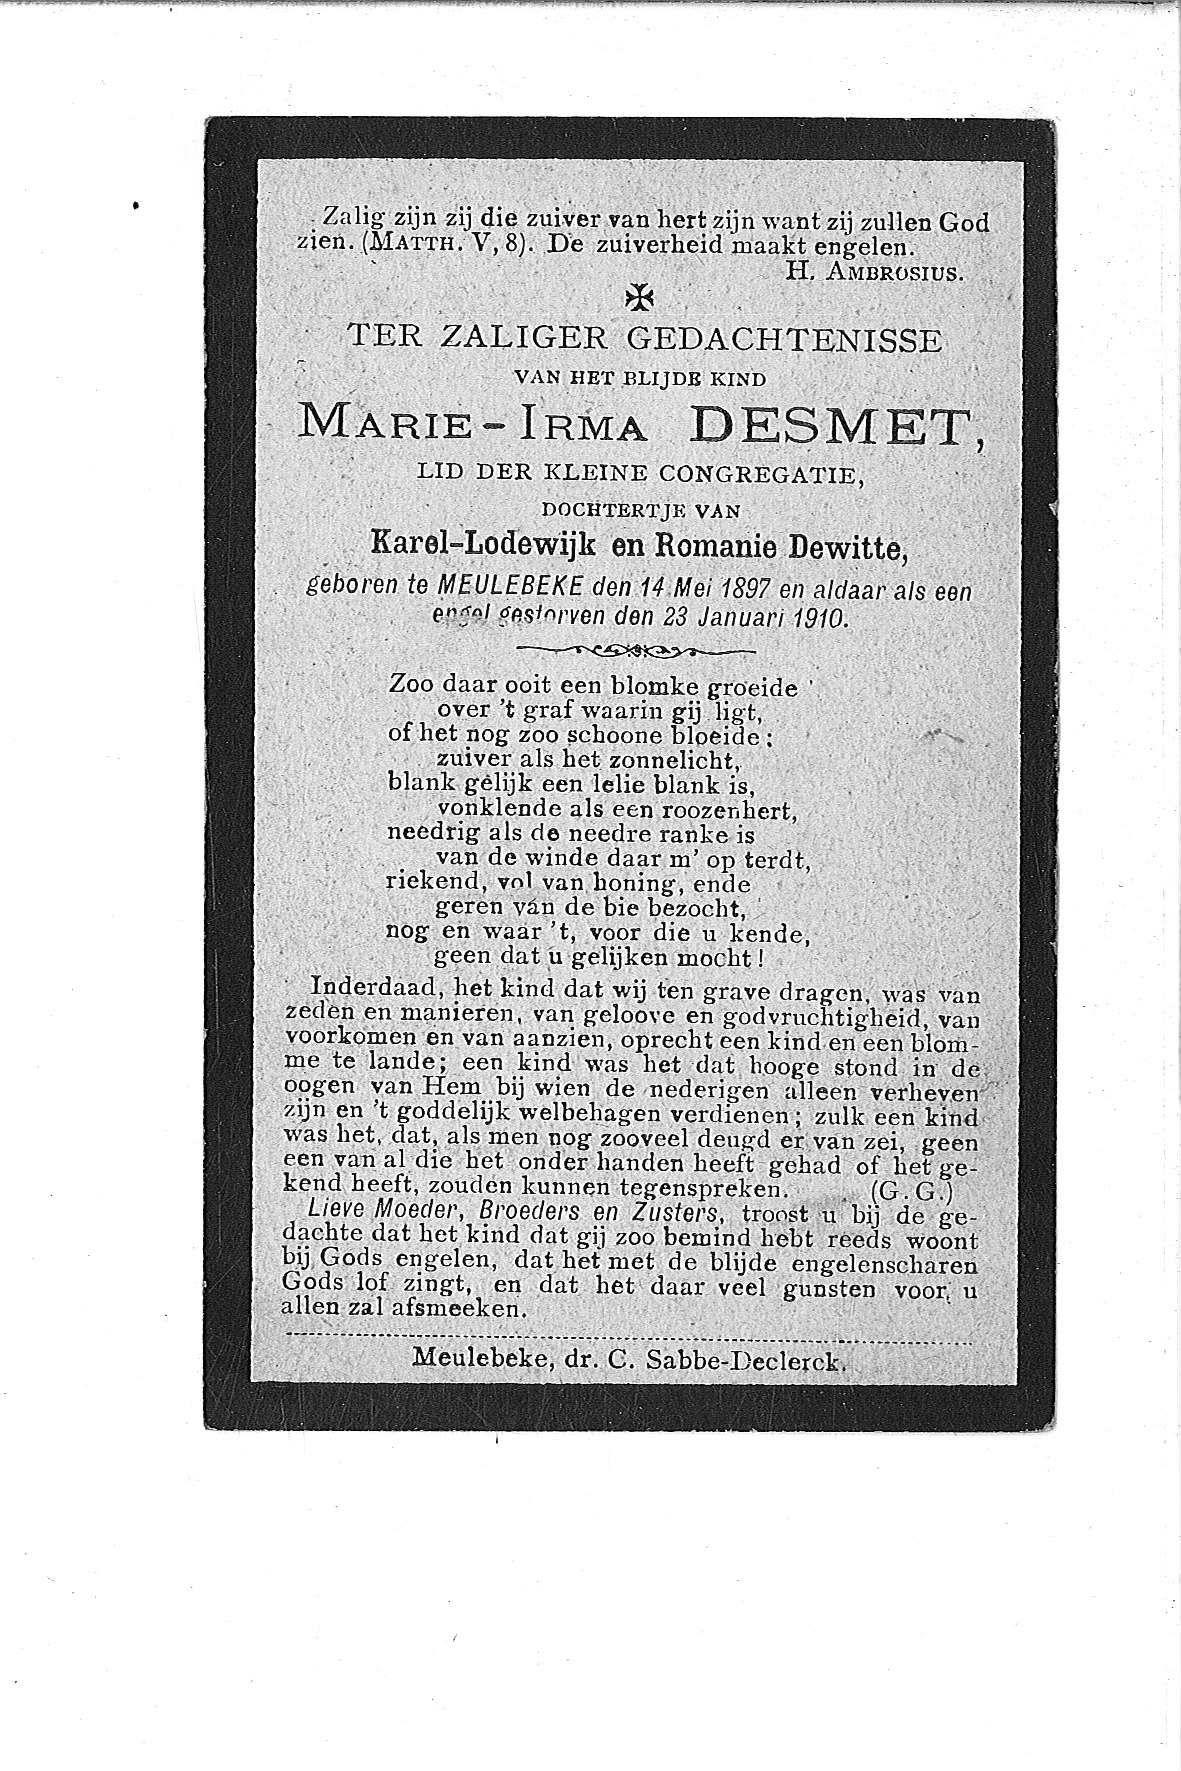 Marie-Irma (1910) 20120424103450_00312.jpg